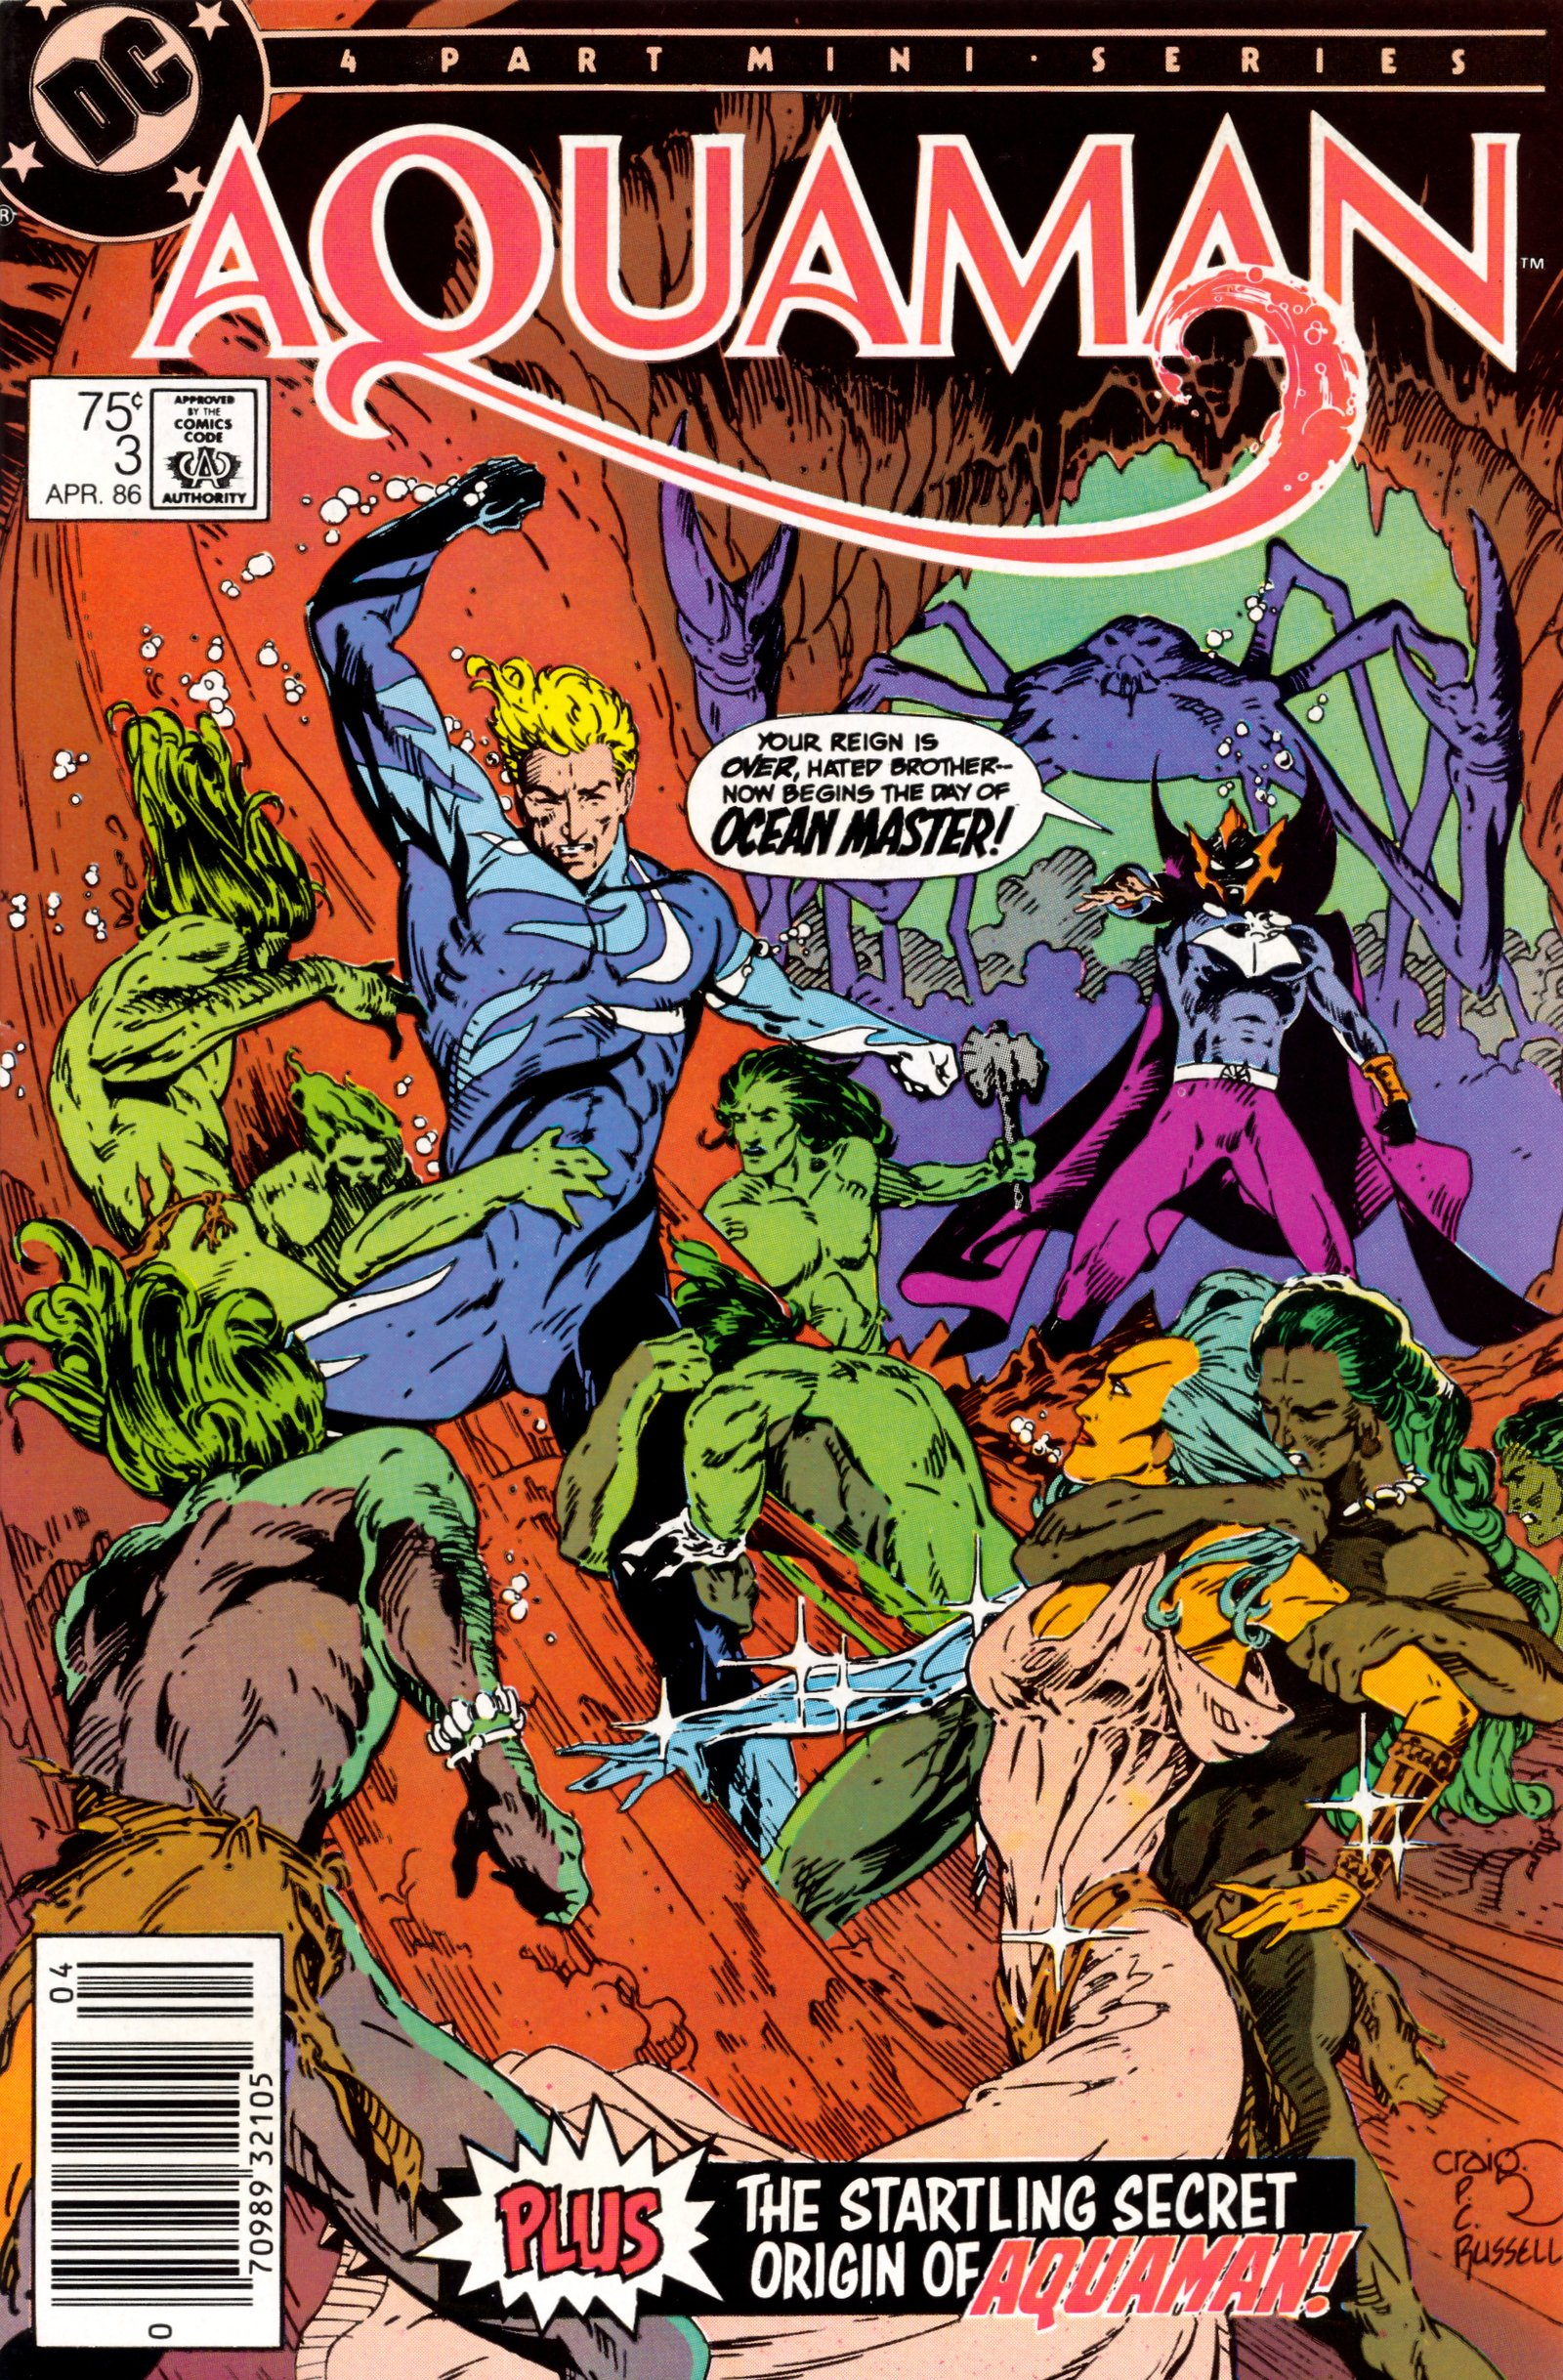 Read online Aquaman (1986) comic -  Issue #3 - 1